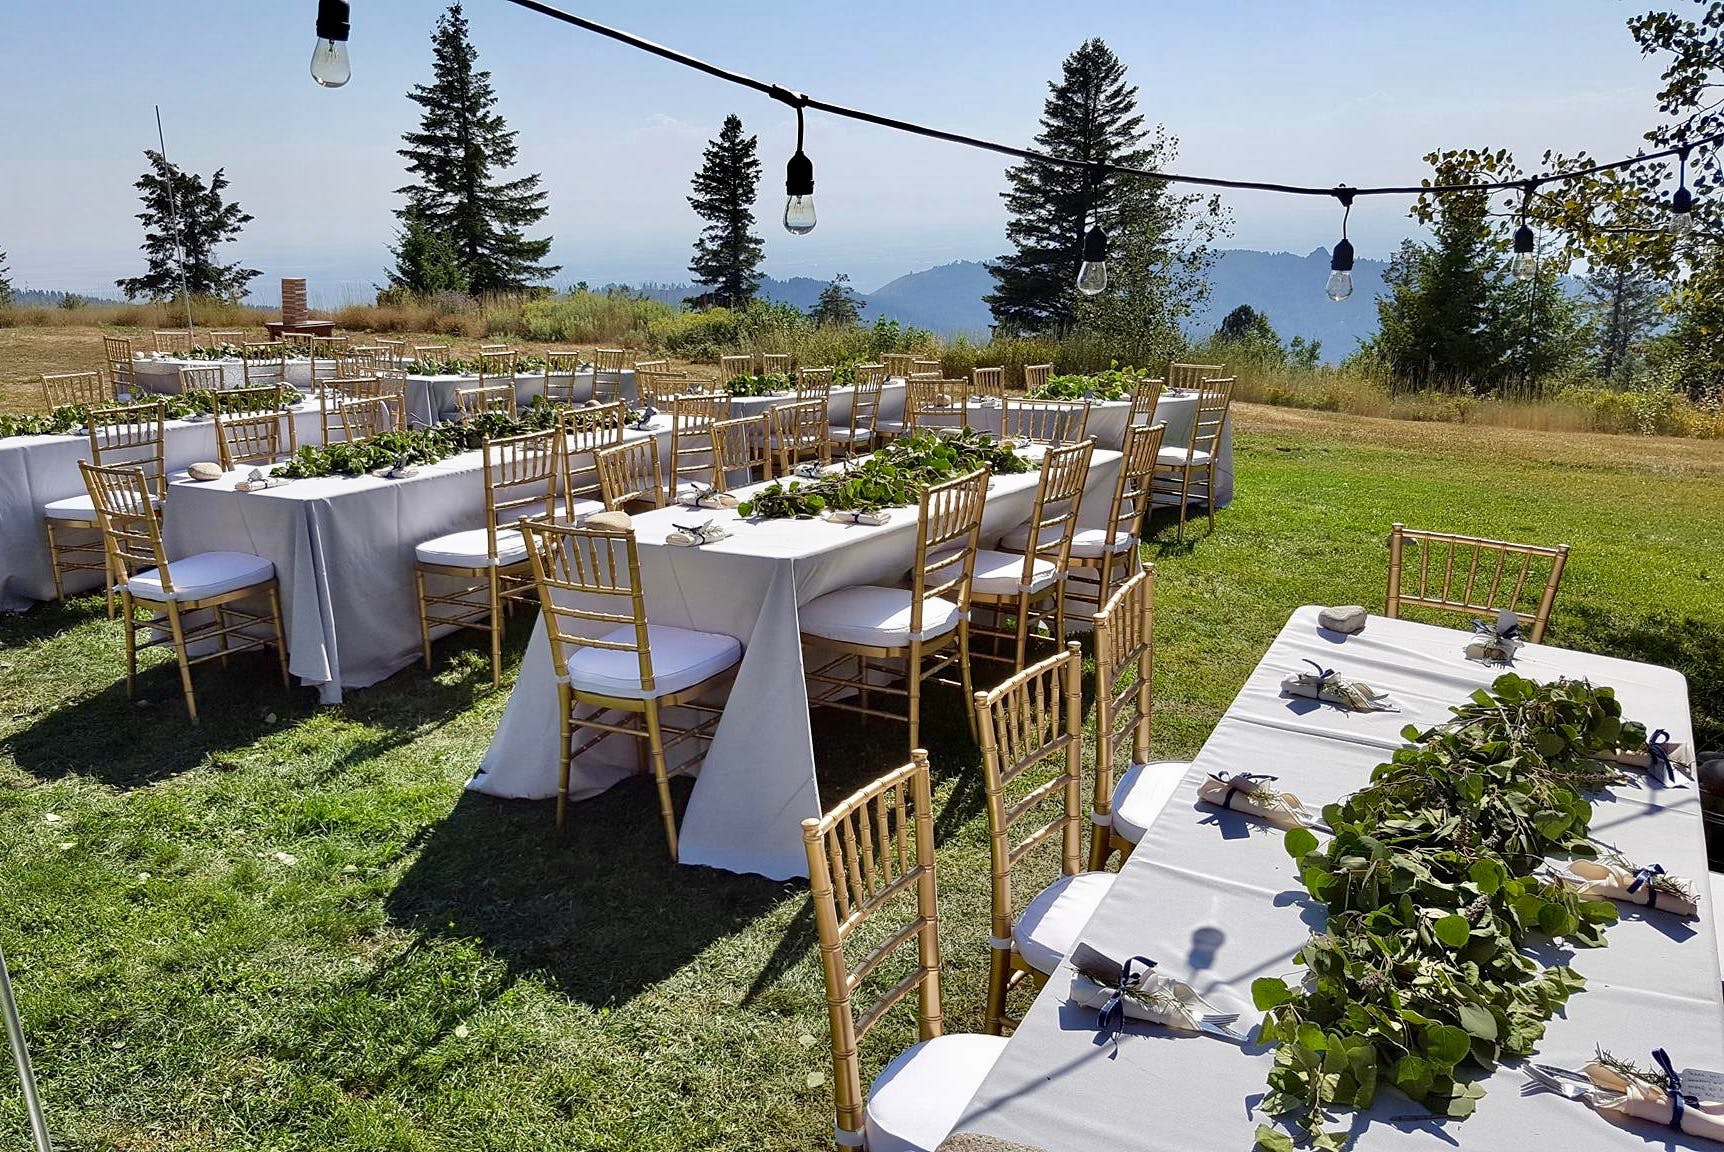 String lights and seating for Bogus Basin wedding dinner